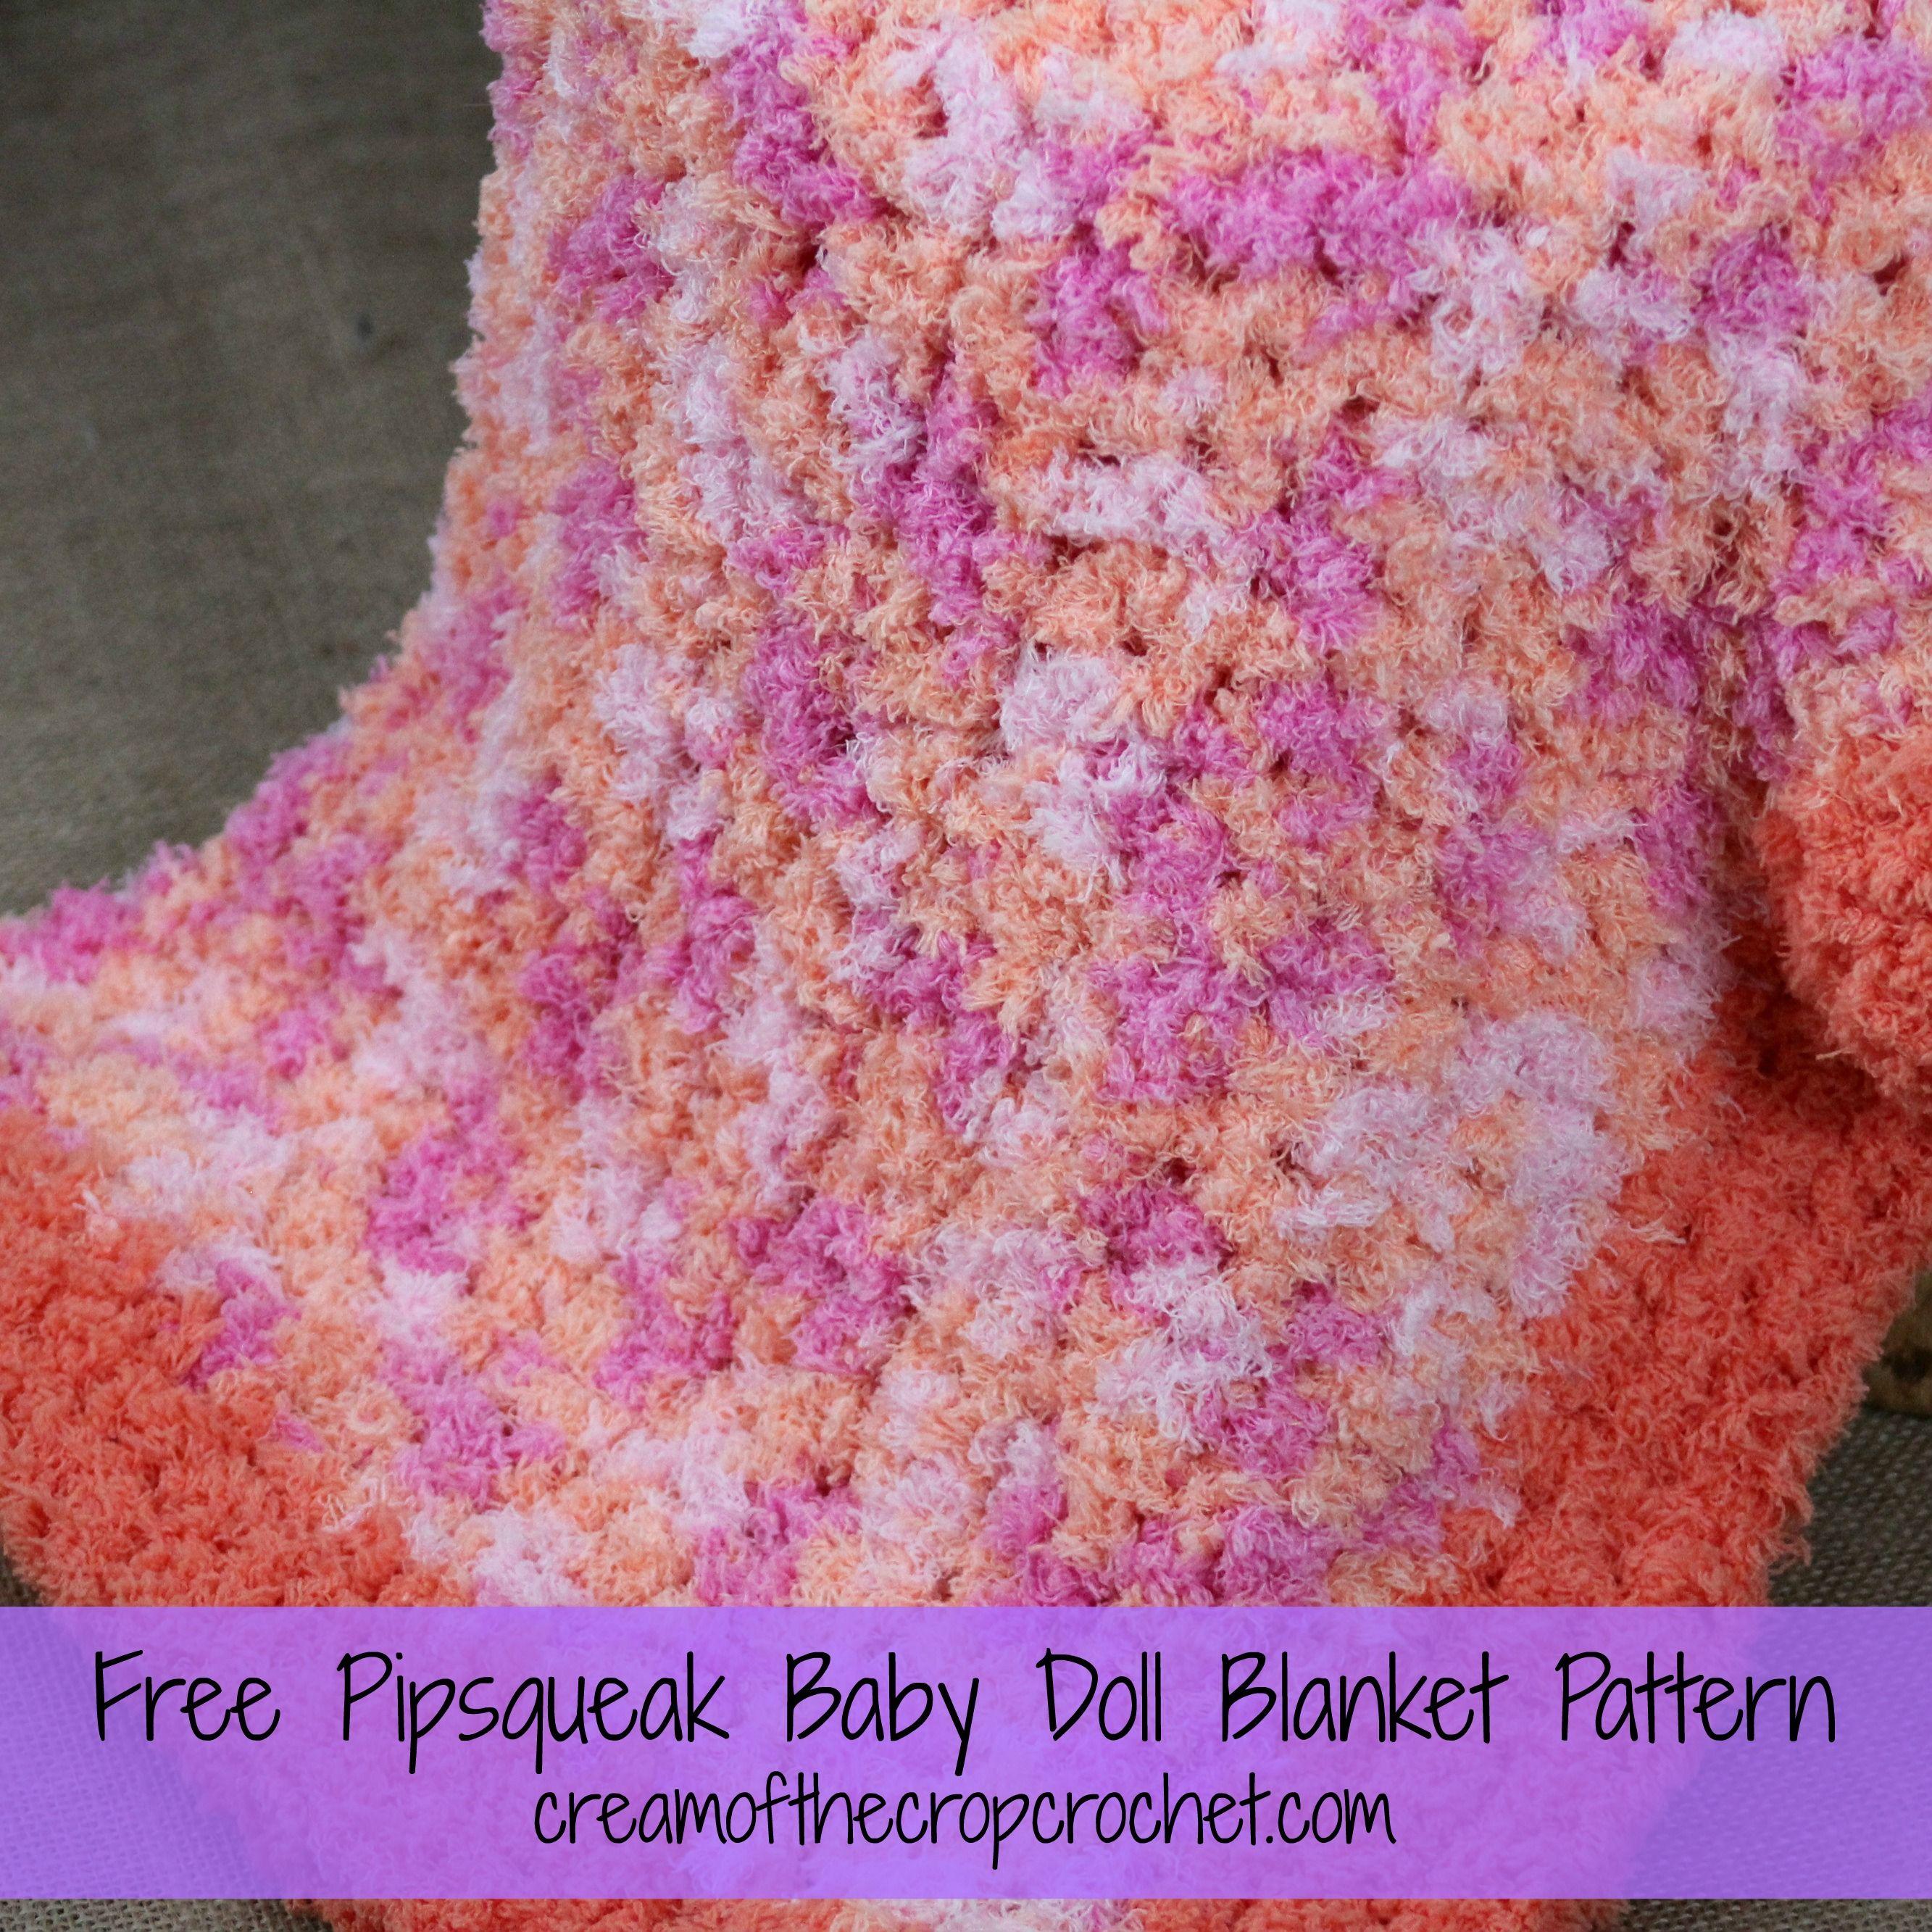 Make This Baby Doll Blanket With 2 Skeins Of Bernat Pipsqueak Yarn